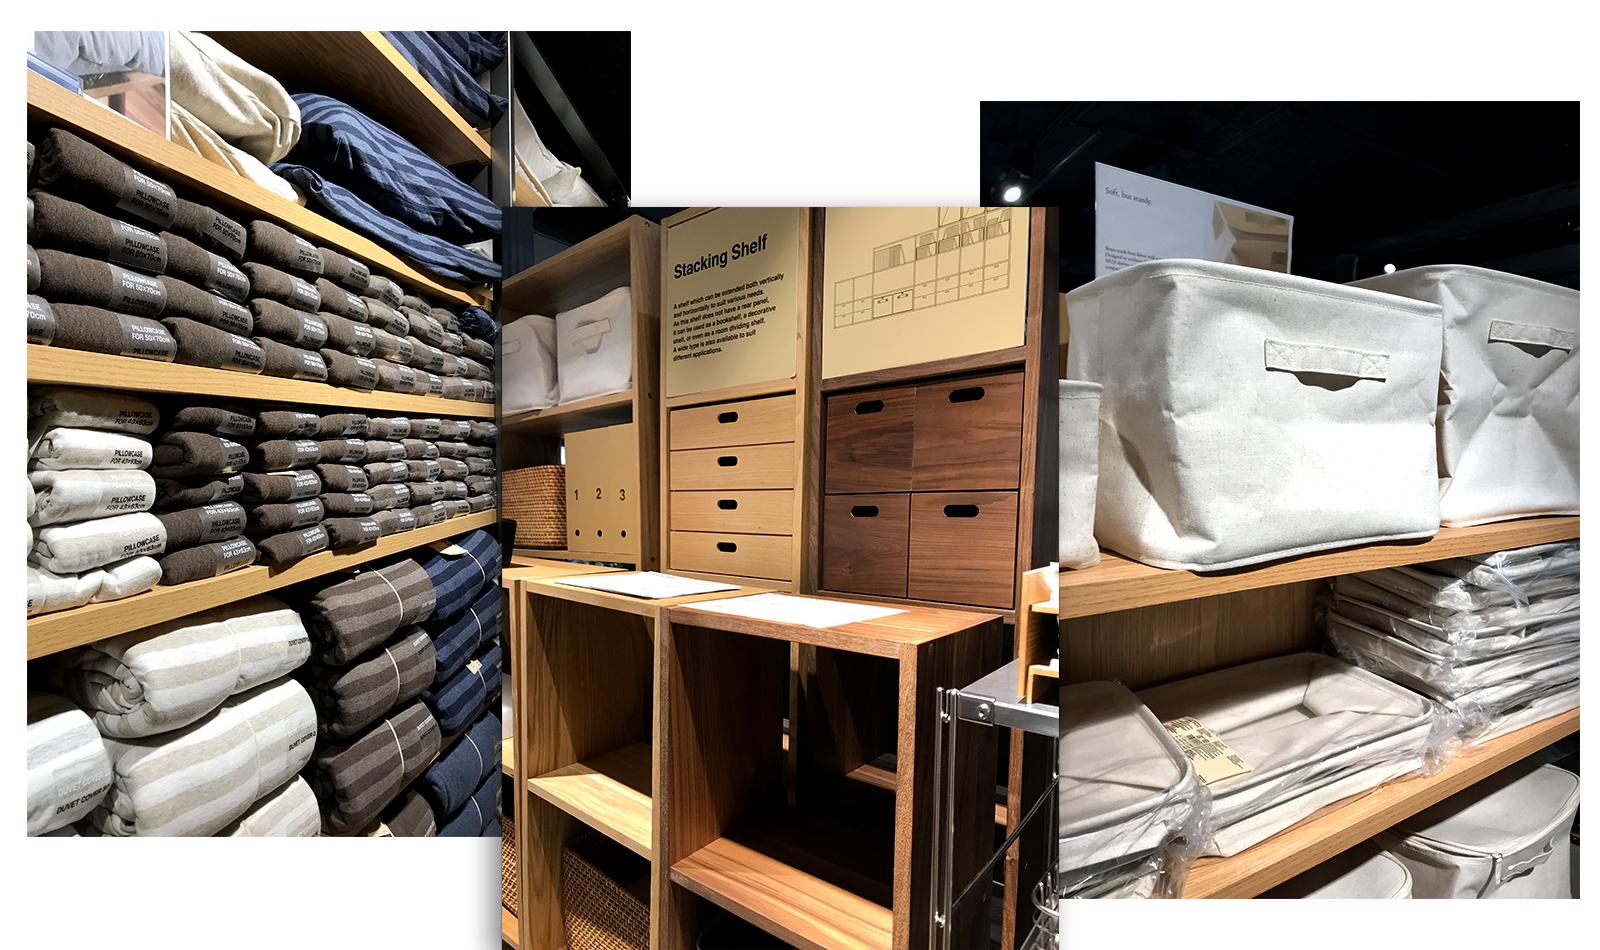 muji-bedroom-shelves-clothing-linens